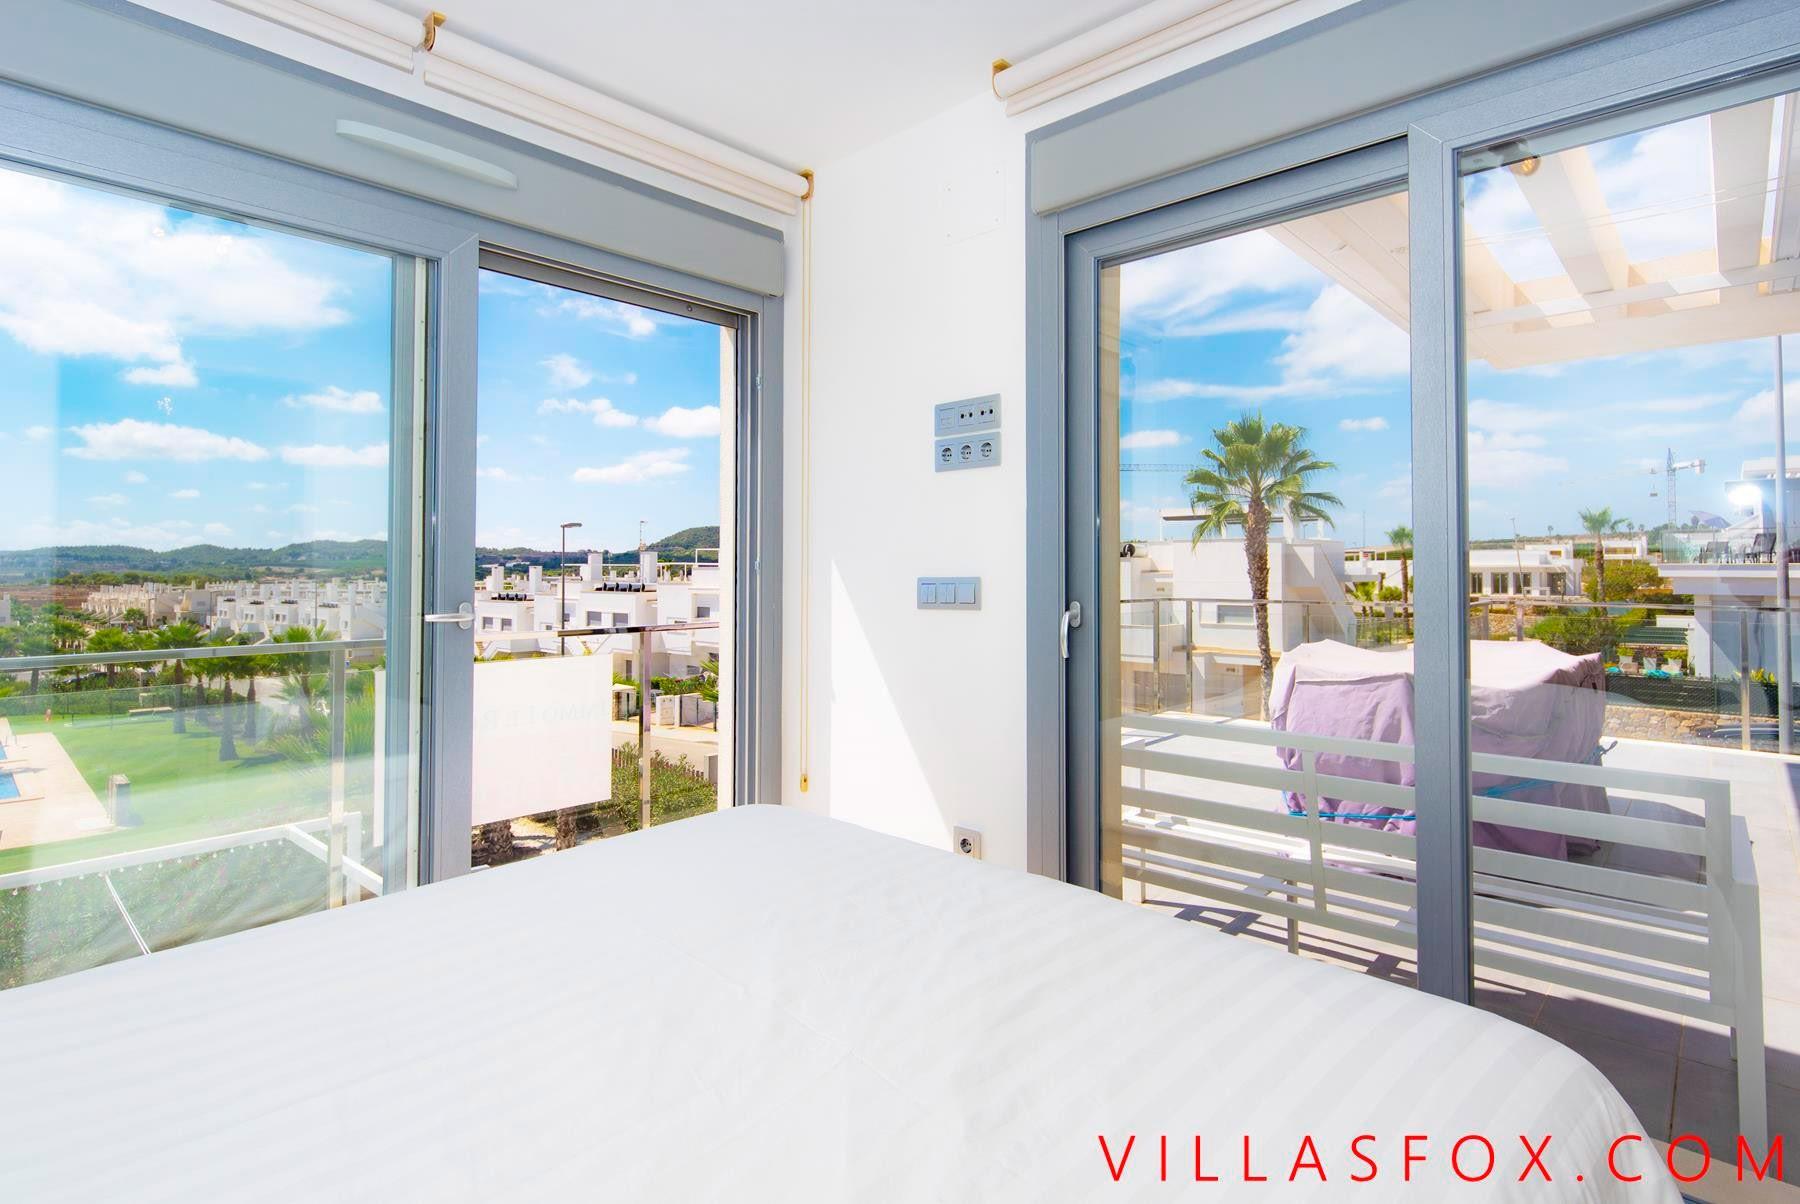 Vistabella Golf penthouse apartment with private solarium, 3 bedrooms, 2 bathrooms